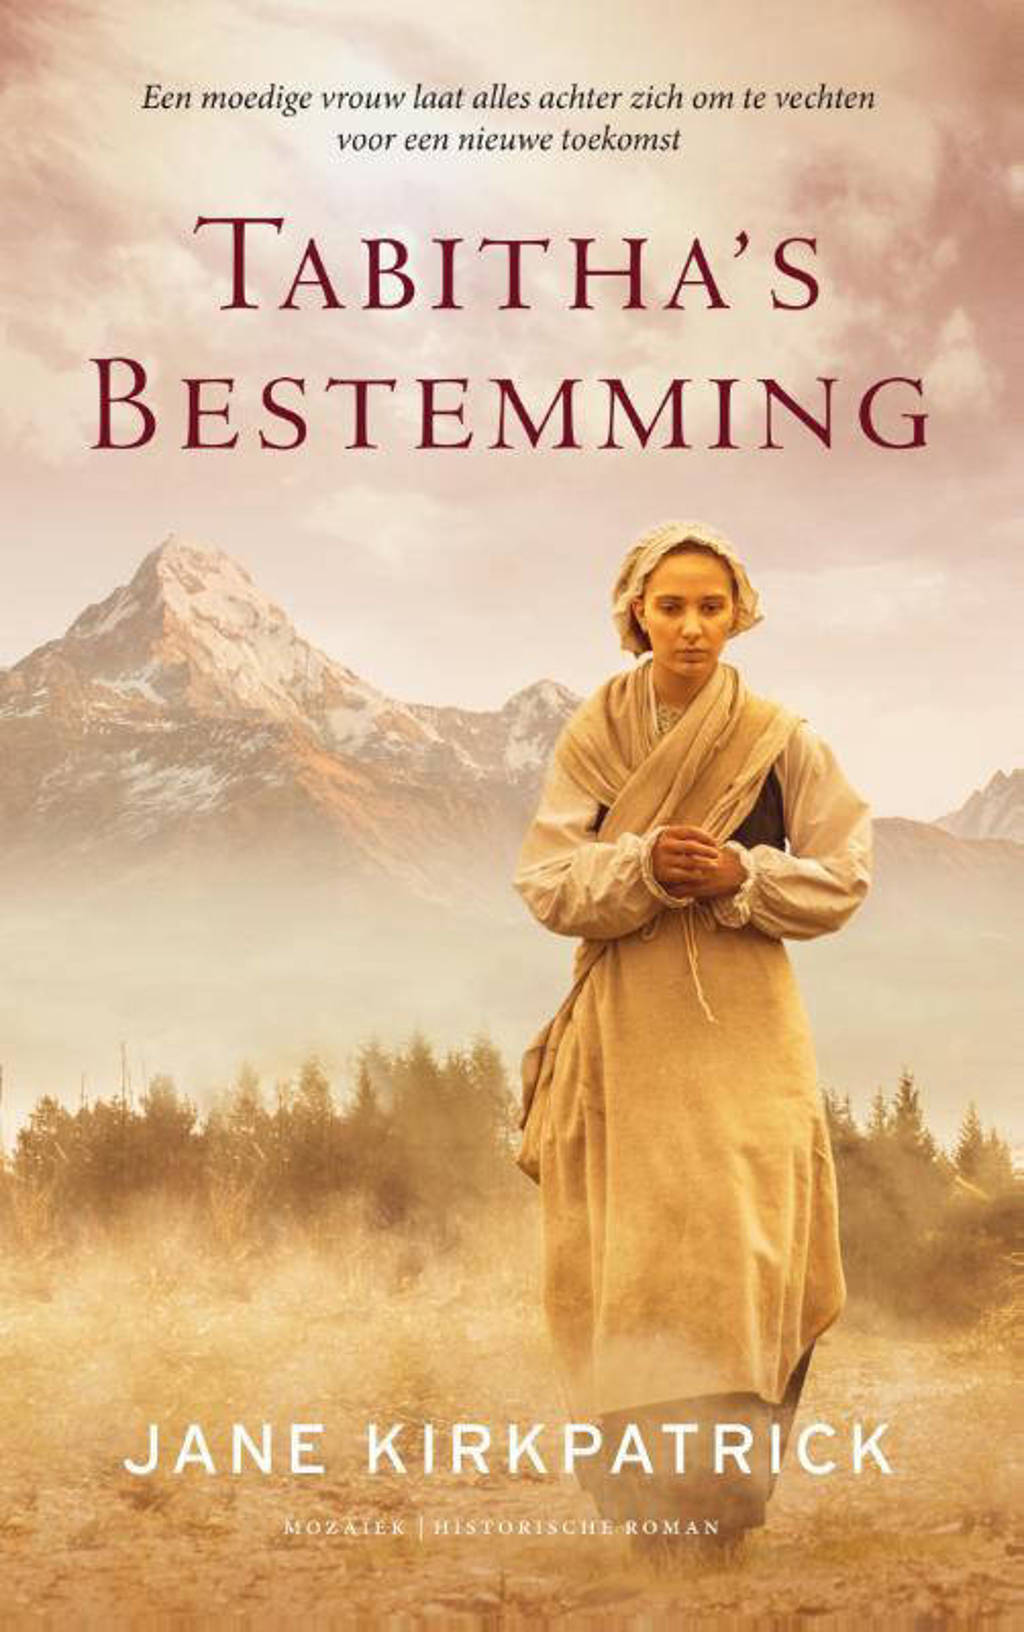 Tabitha's bestemming - Jane Kirkpatrick